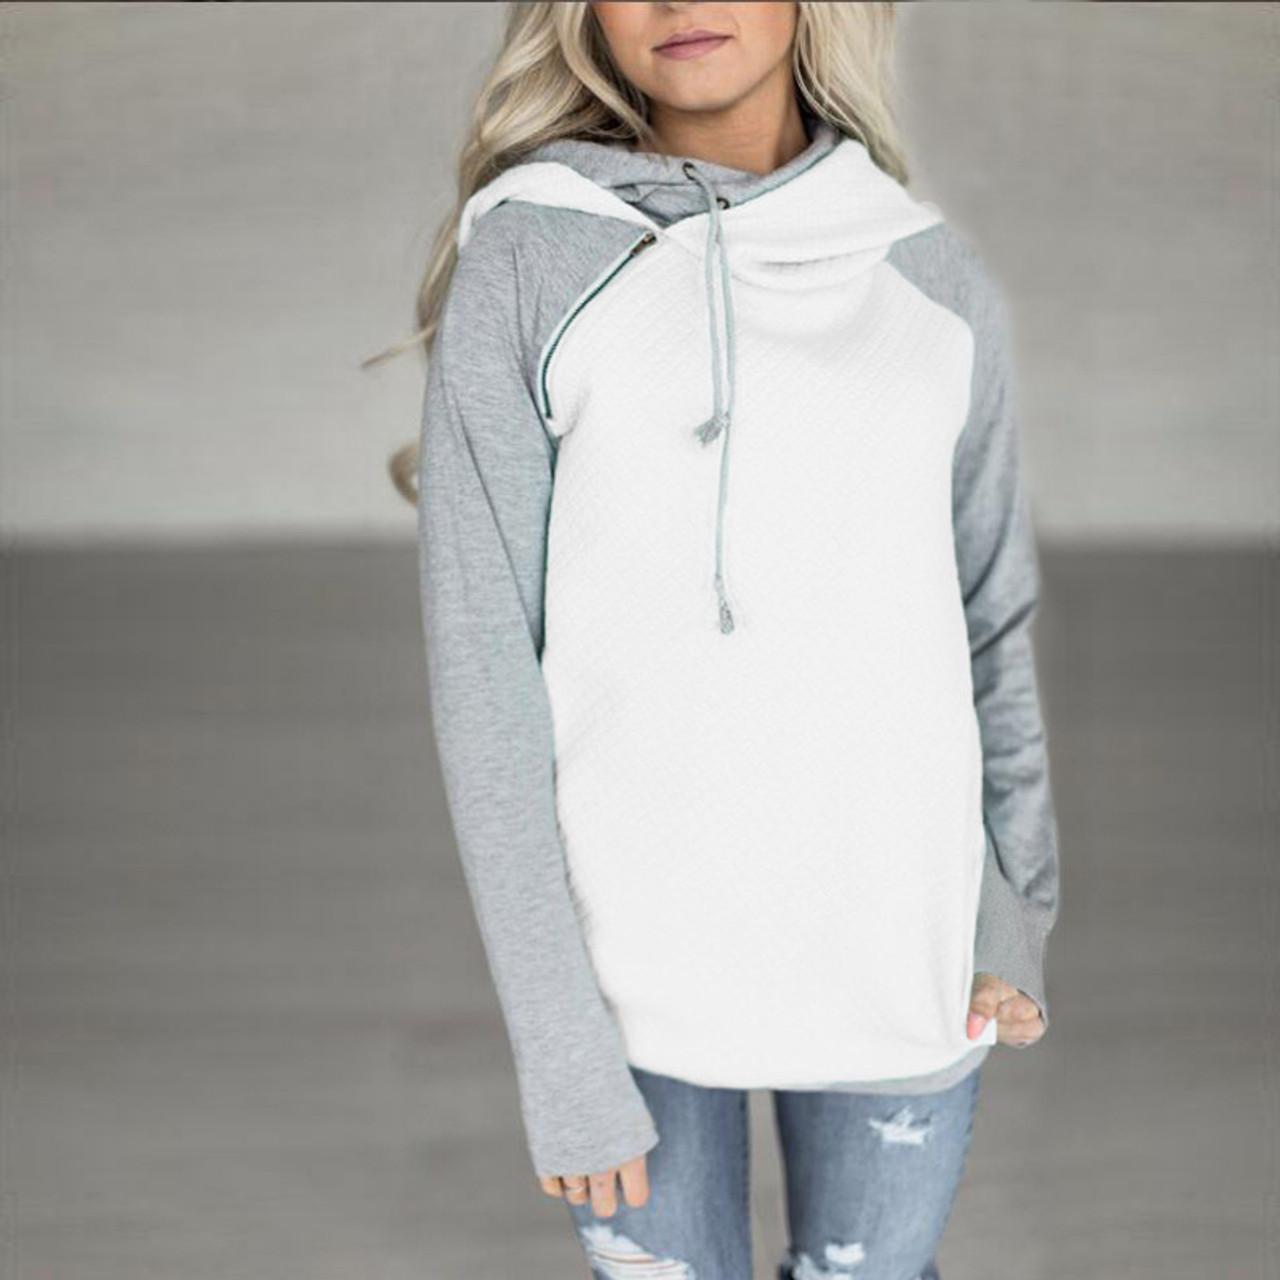 b55650b82 Oversize Hoodies Sweatshirts Women Pullover Hoodie Female Patchwork Double  Hood Hooded Sweatshirt Autumn Coat Warm Hoody XXXL